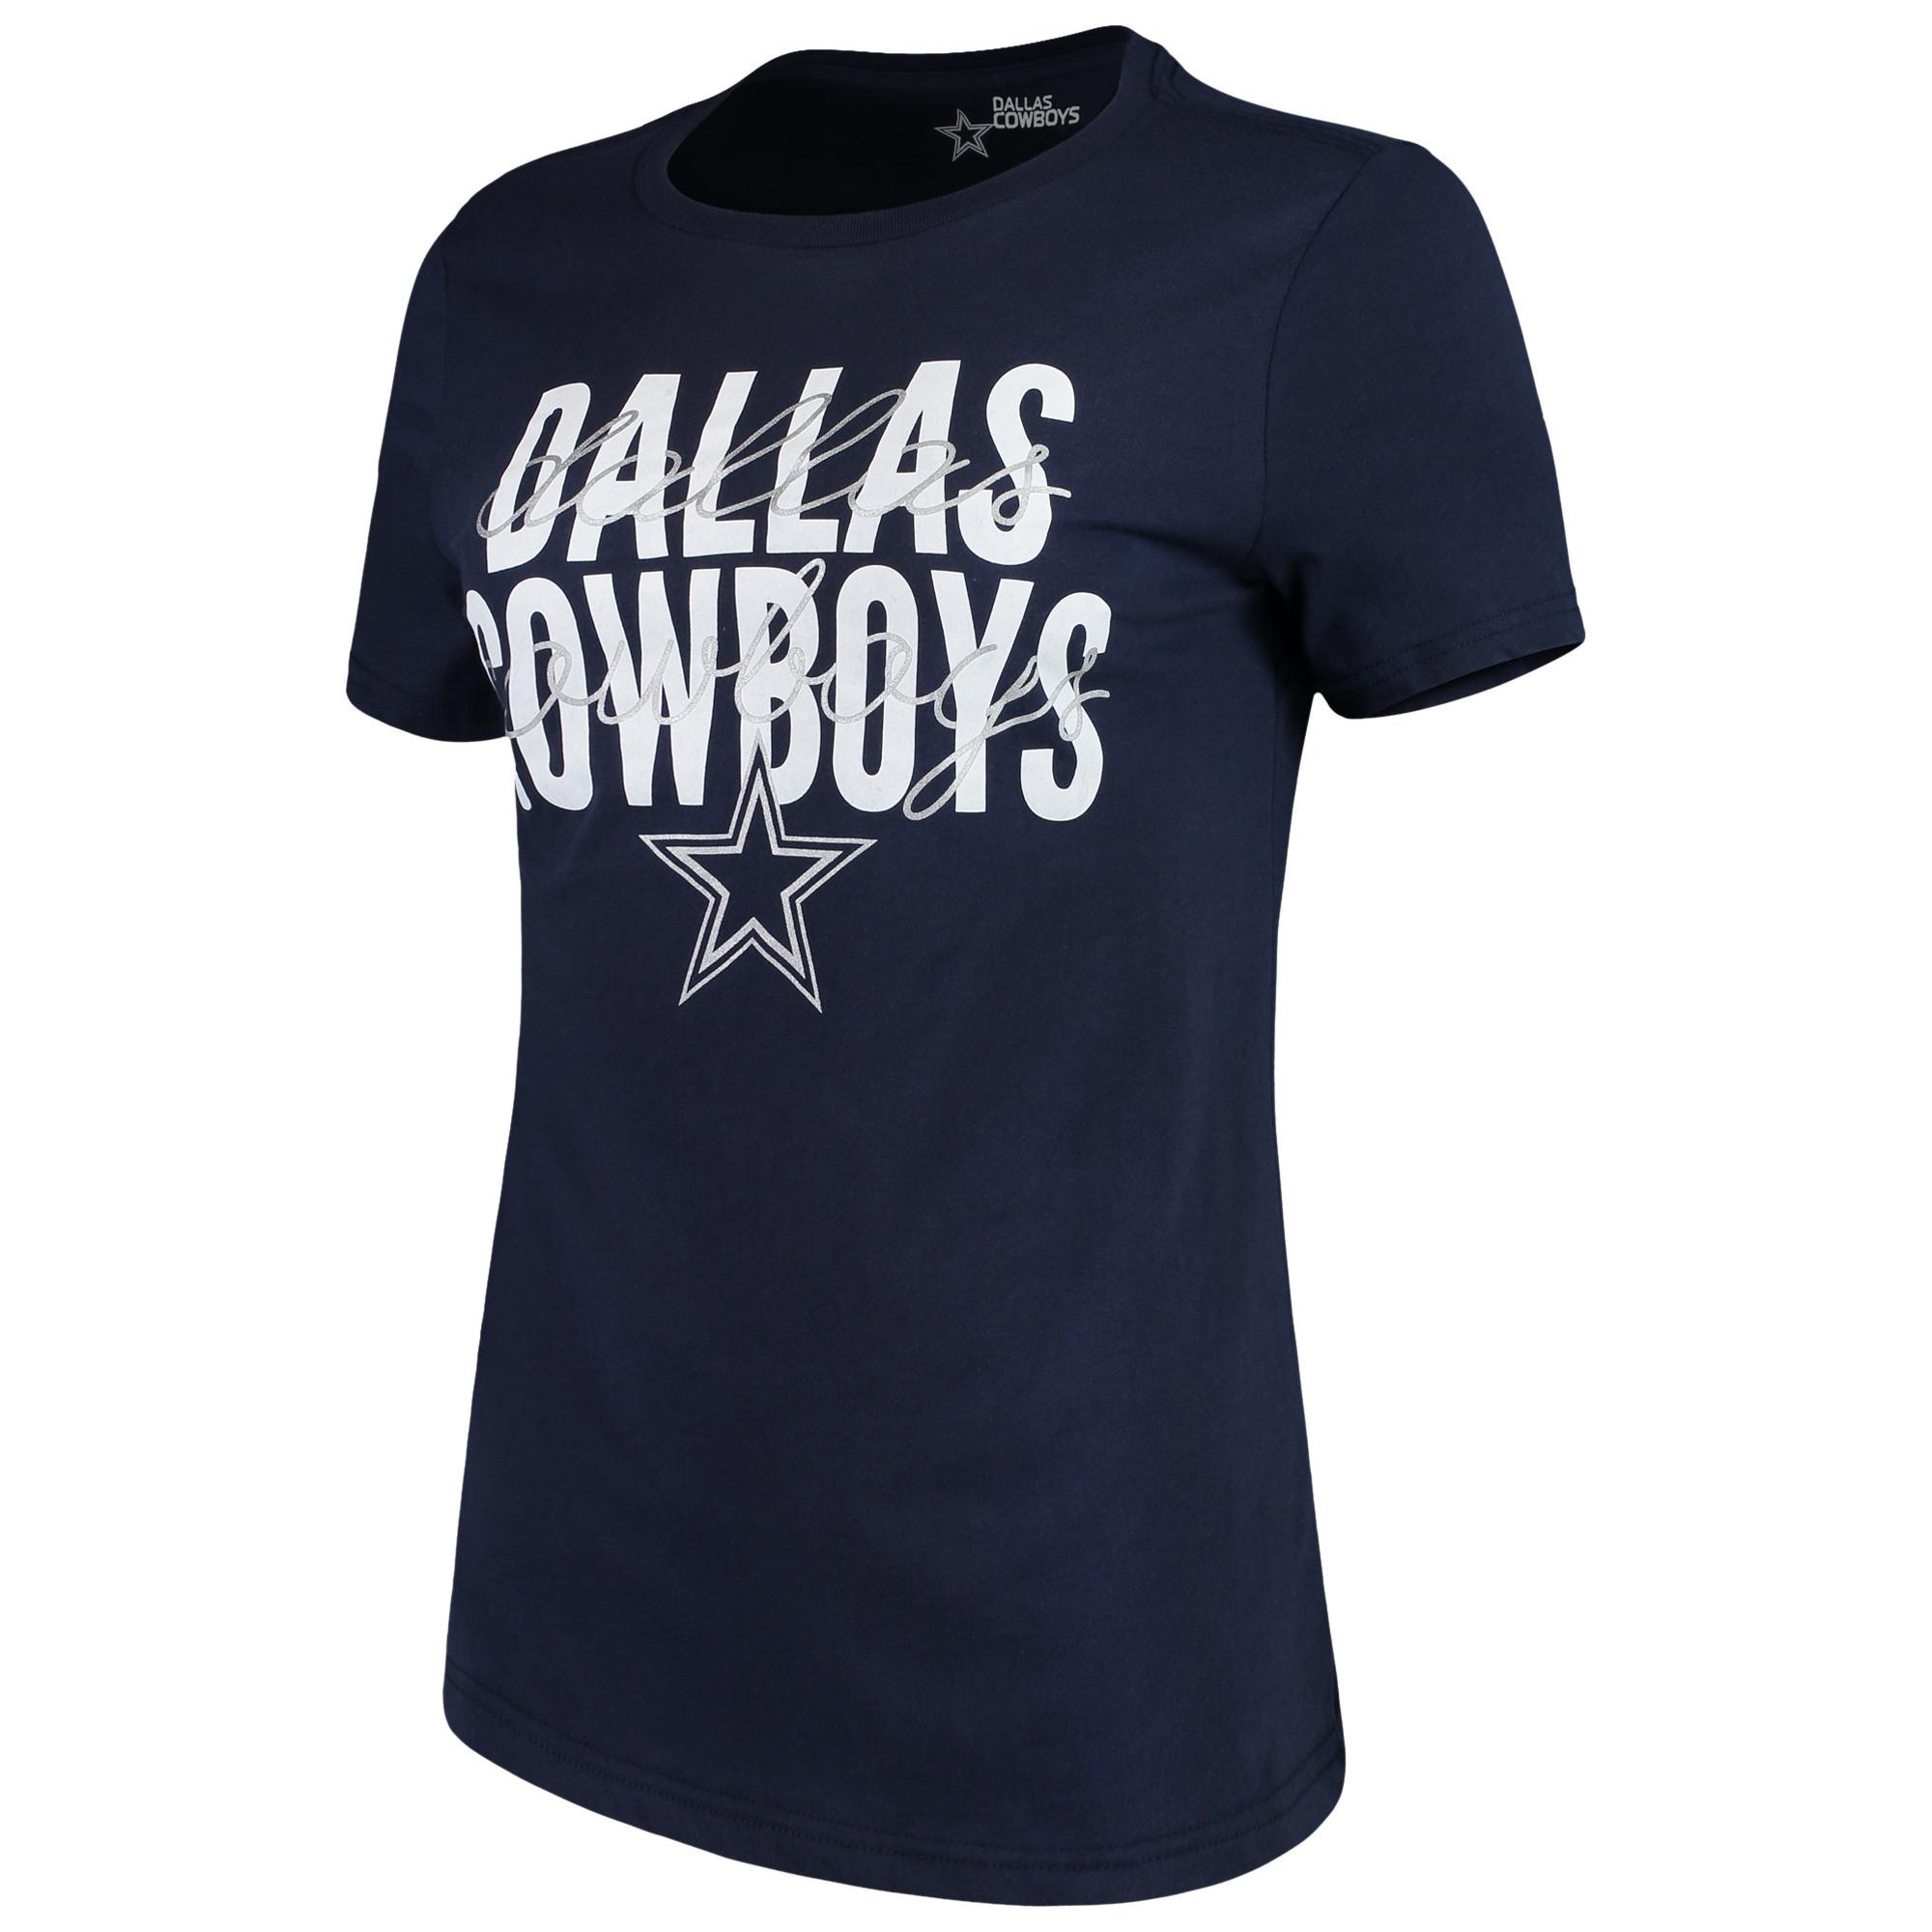 ... sale product image womens navy dallas cowboys jaco t shirt b140d df92a 1c4ad4a7c